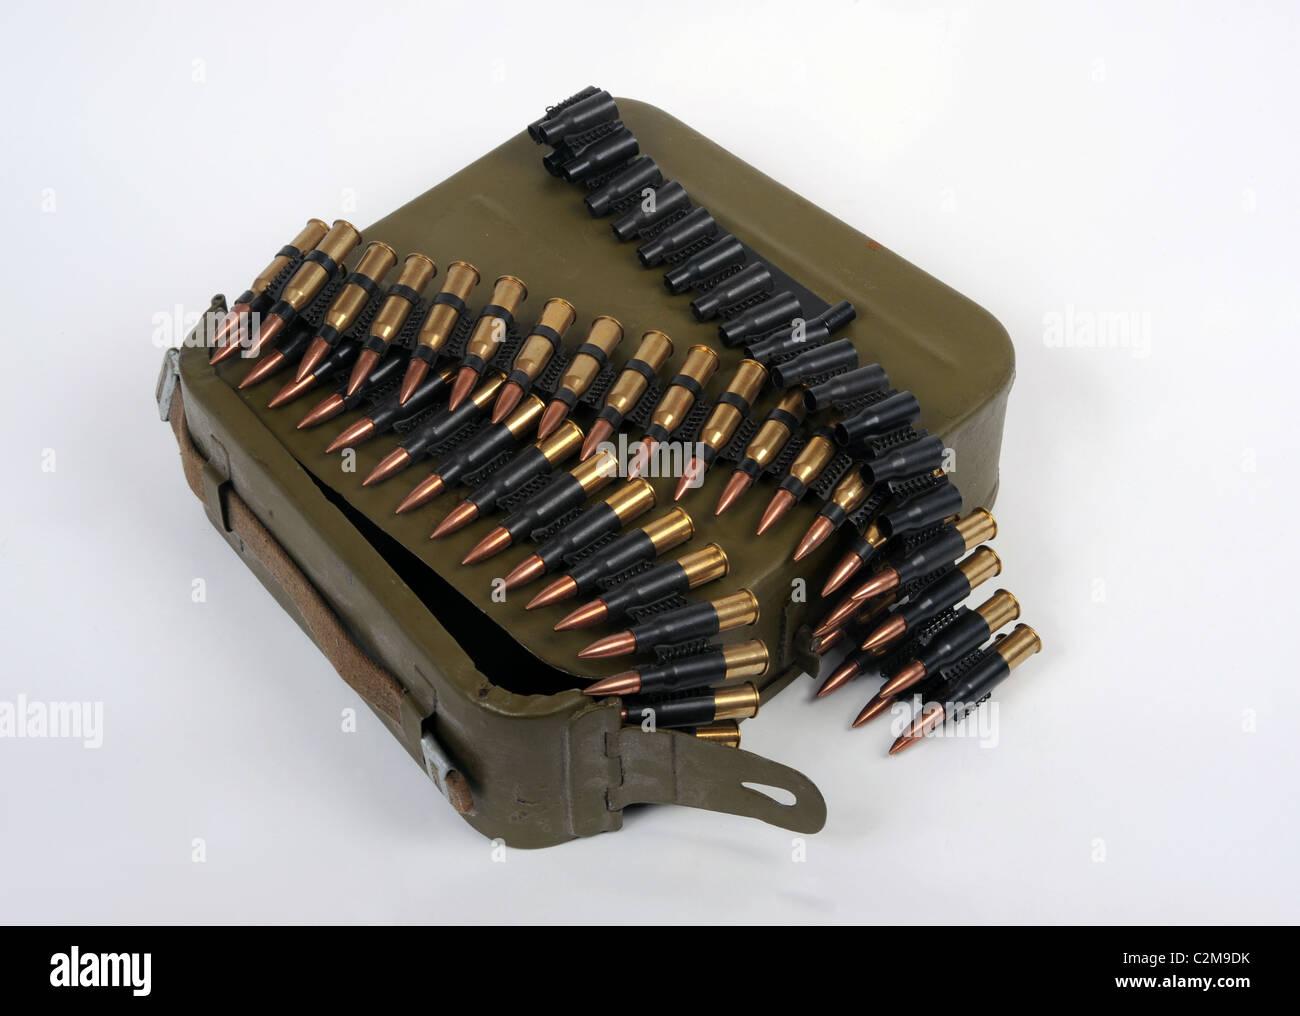 Russian 7.62mm belt fed machine gun ammunition - Stock Image